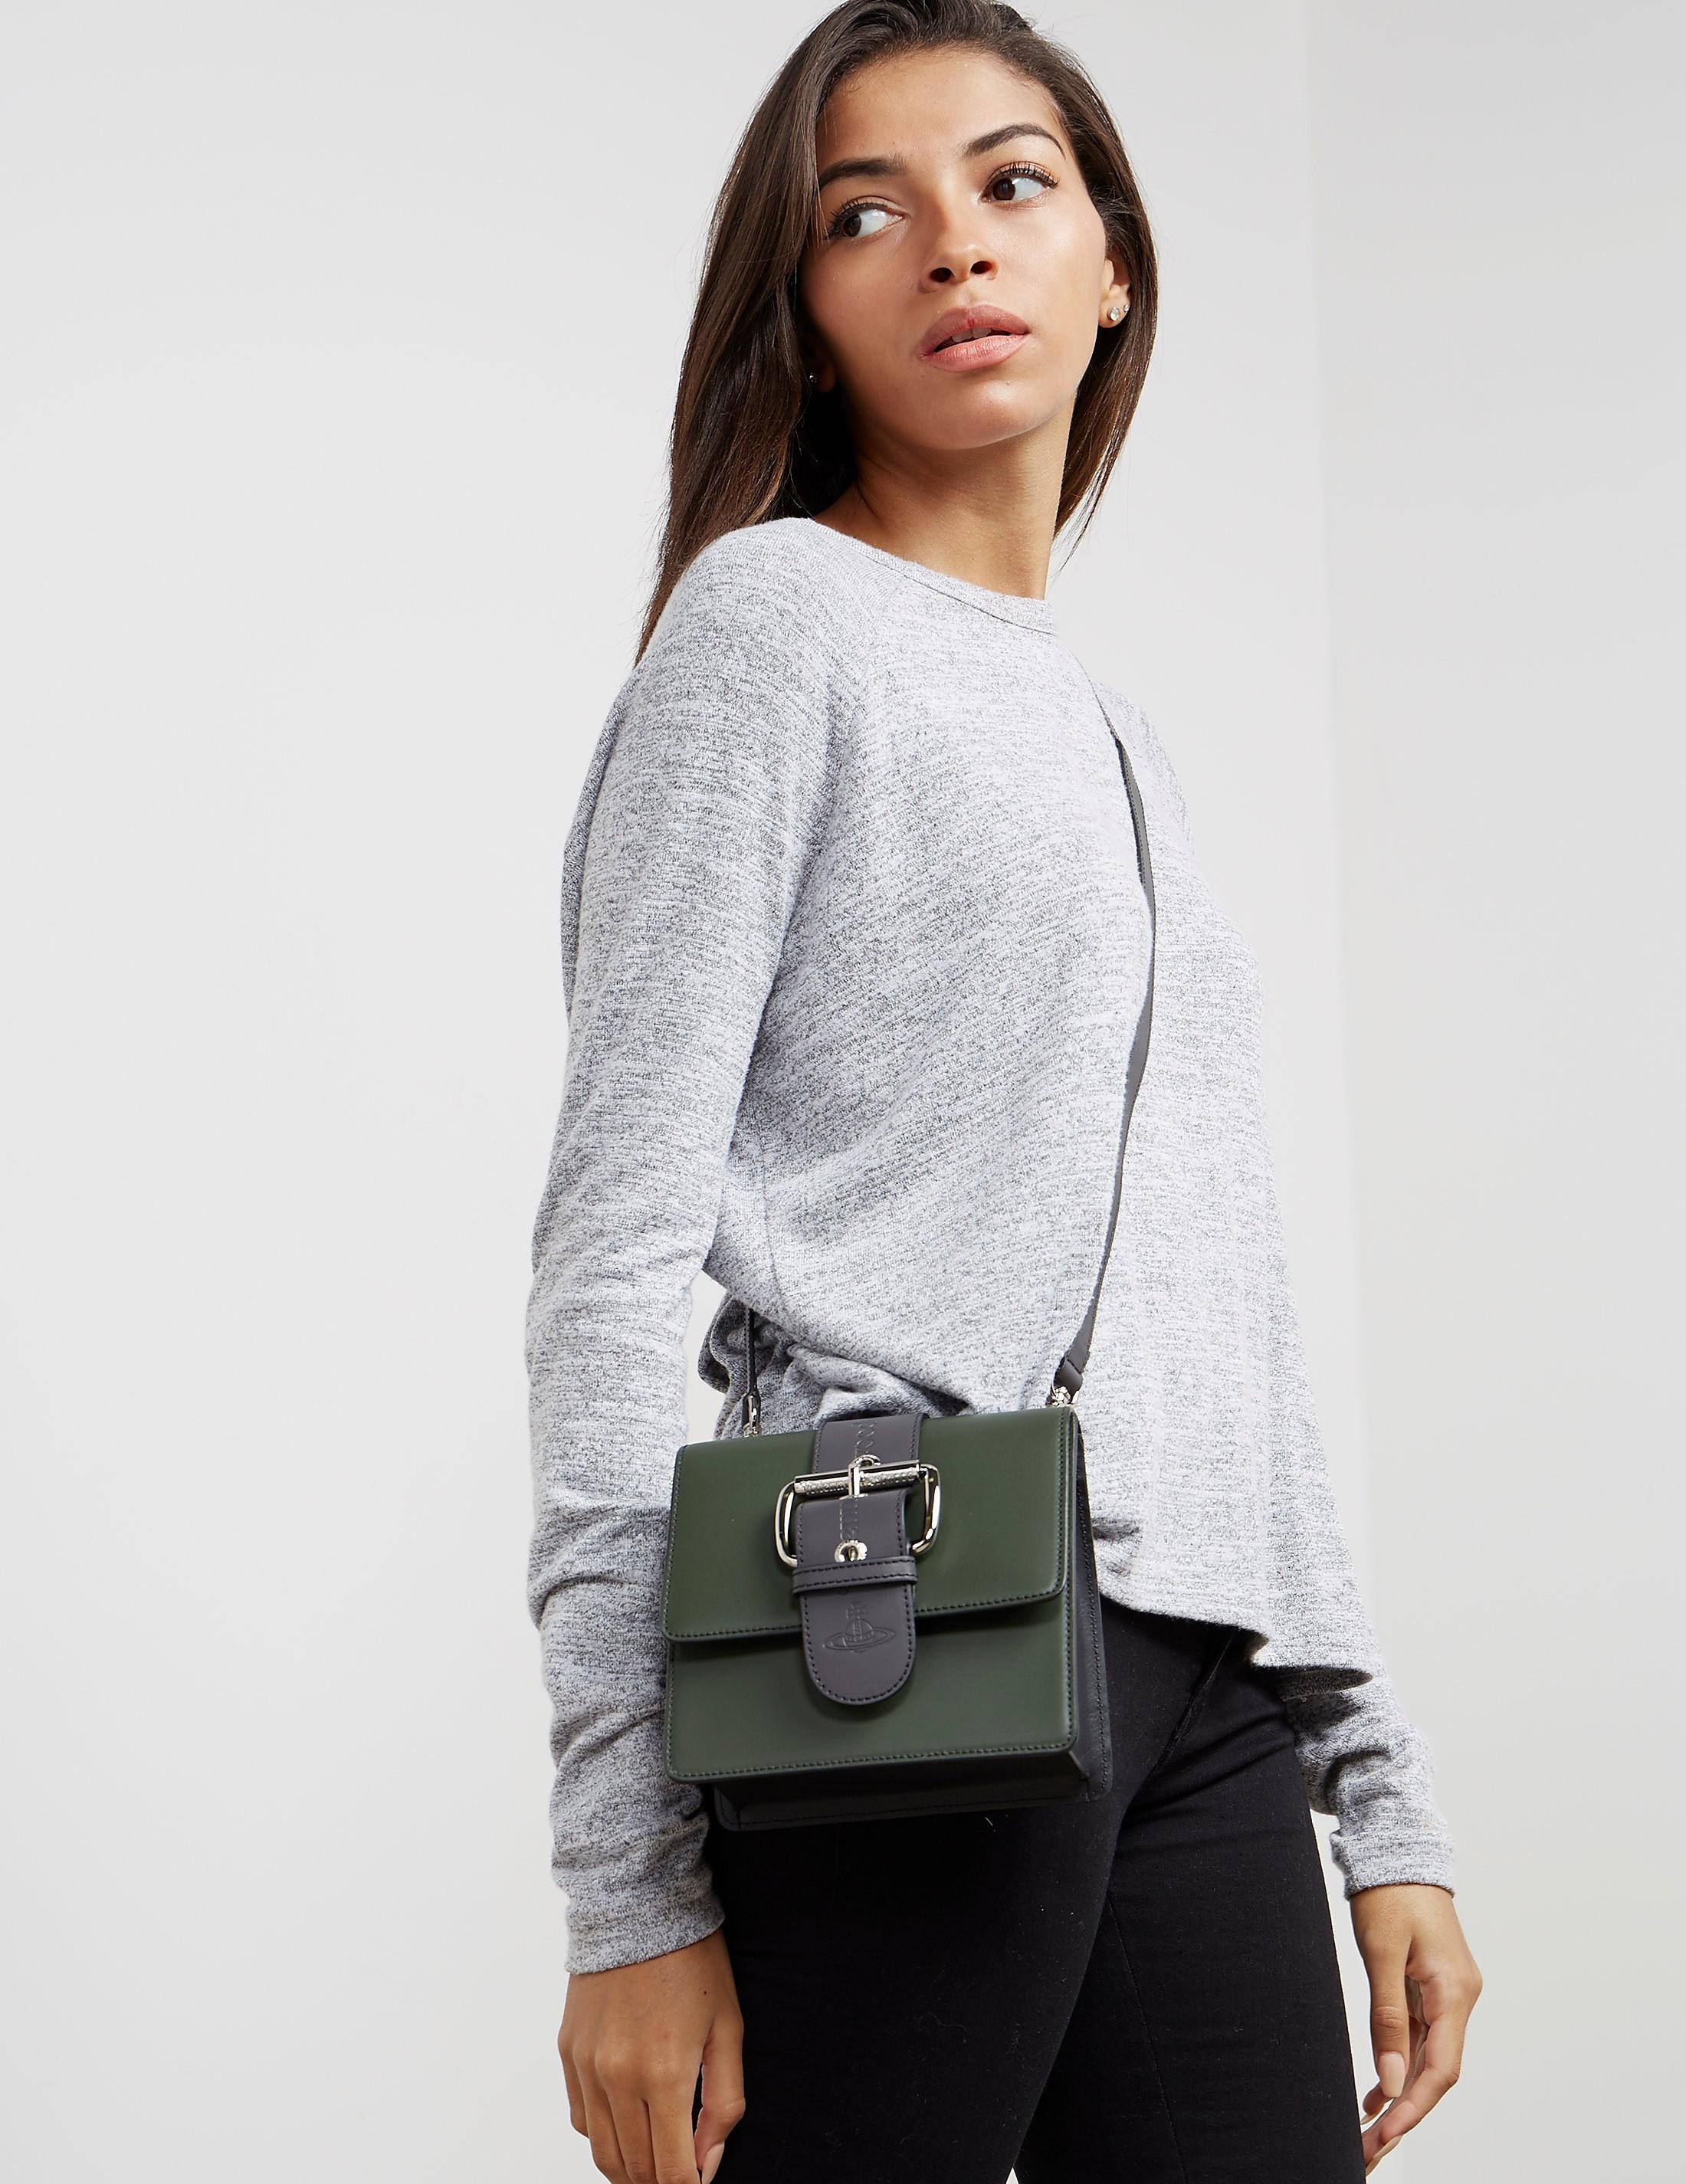 Vivienne Westwood Alex Small Bag